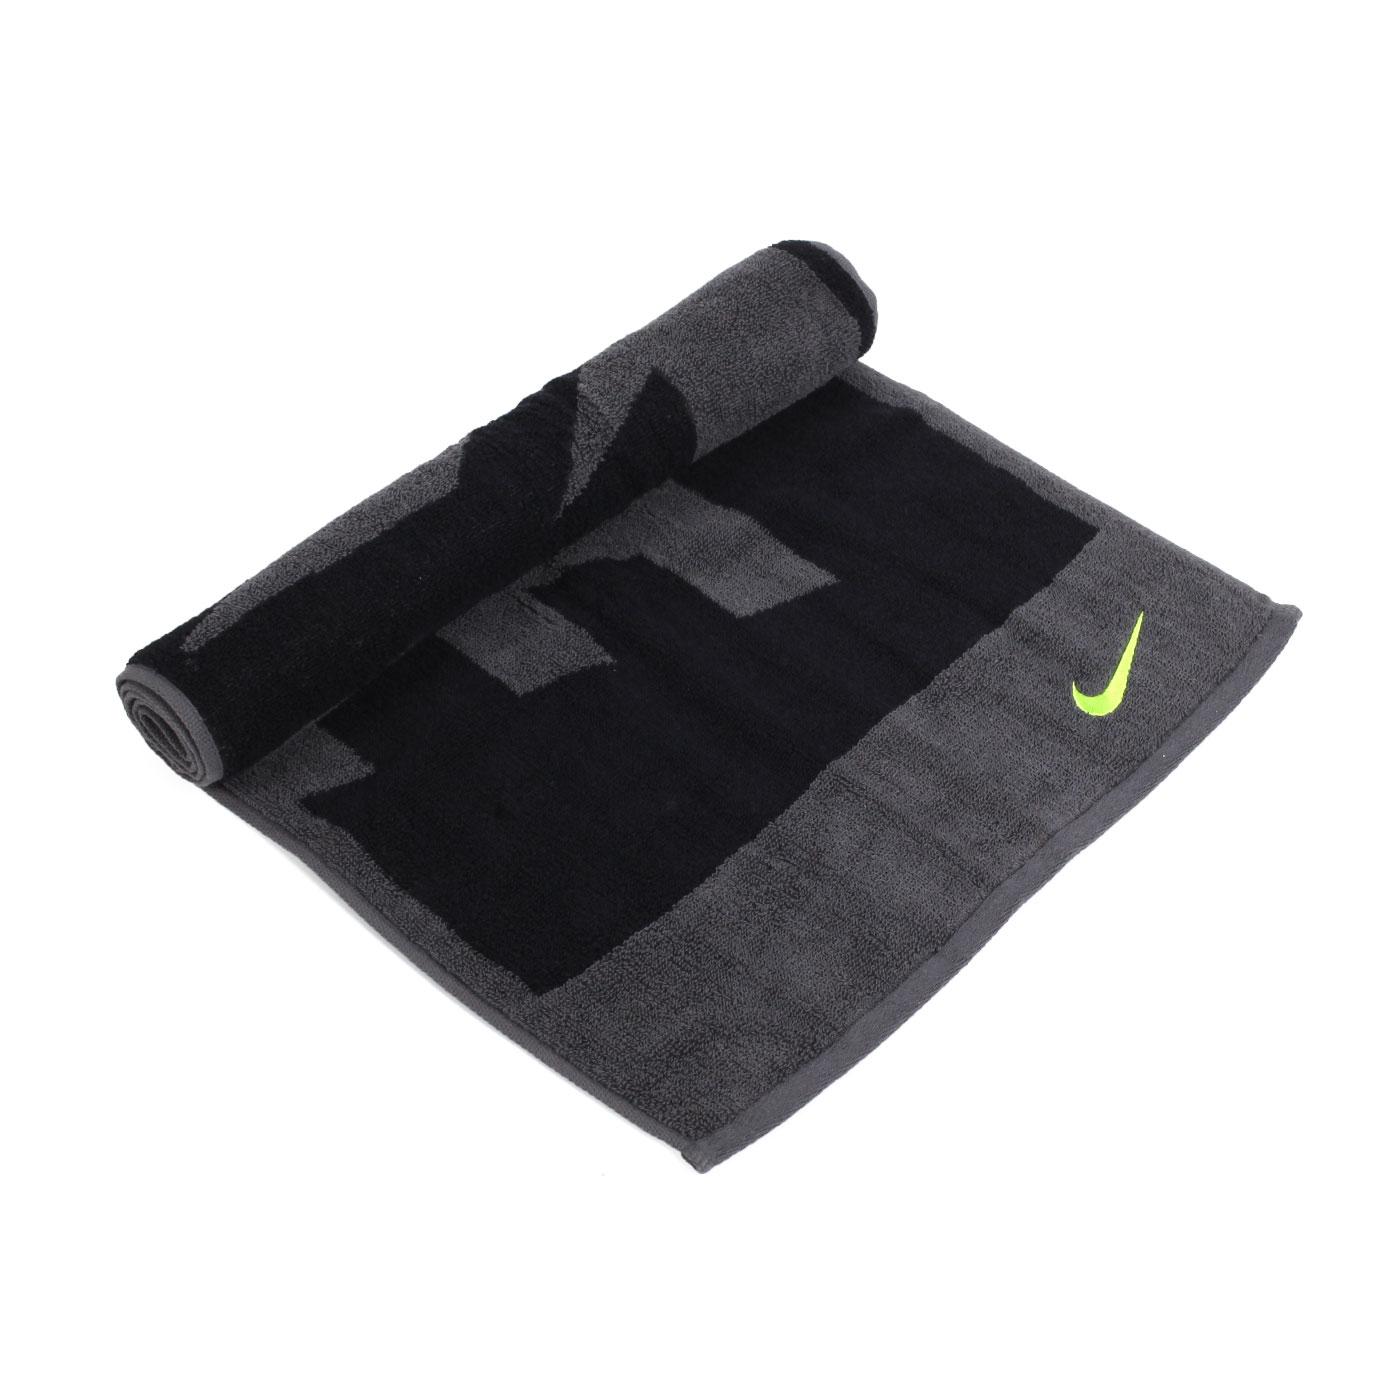 NIKE 日式盒裝毛巾 NTT81063MD - 黑灰螢光黃